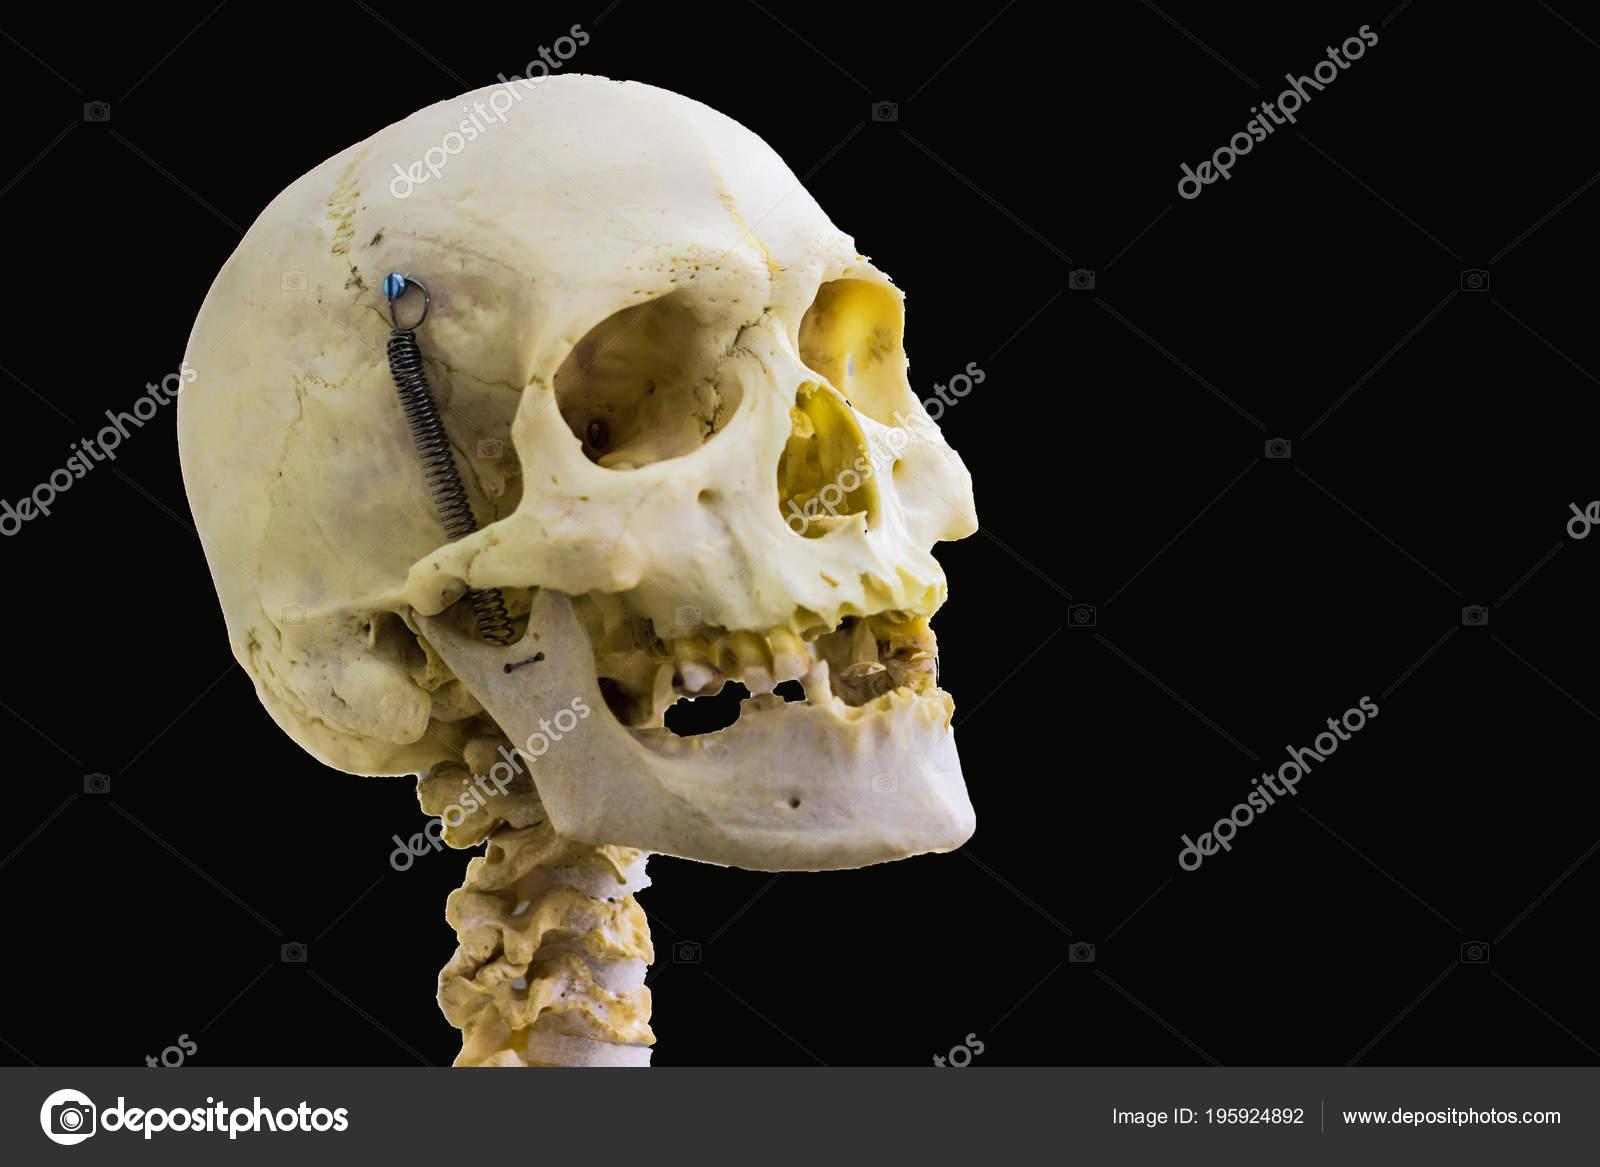 Articulated Human Skull Bone Cervical Vertebrae Head Neck Anatomy